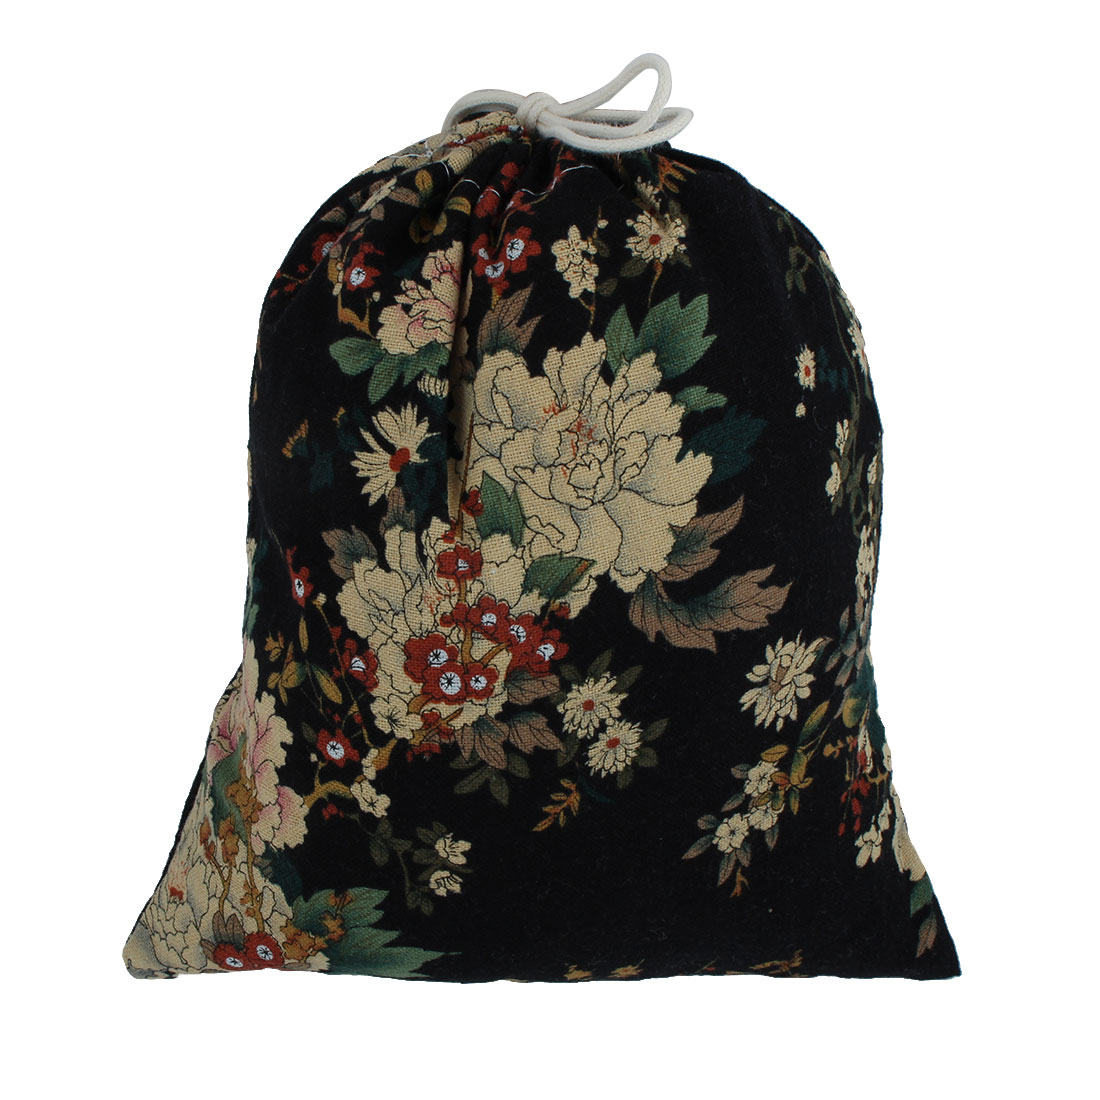 Outdoor Travel Flower Printed Storage Packing Pouch Drawstring Bag Black Medium